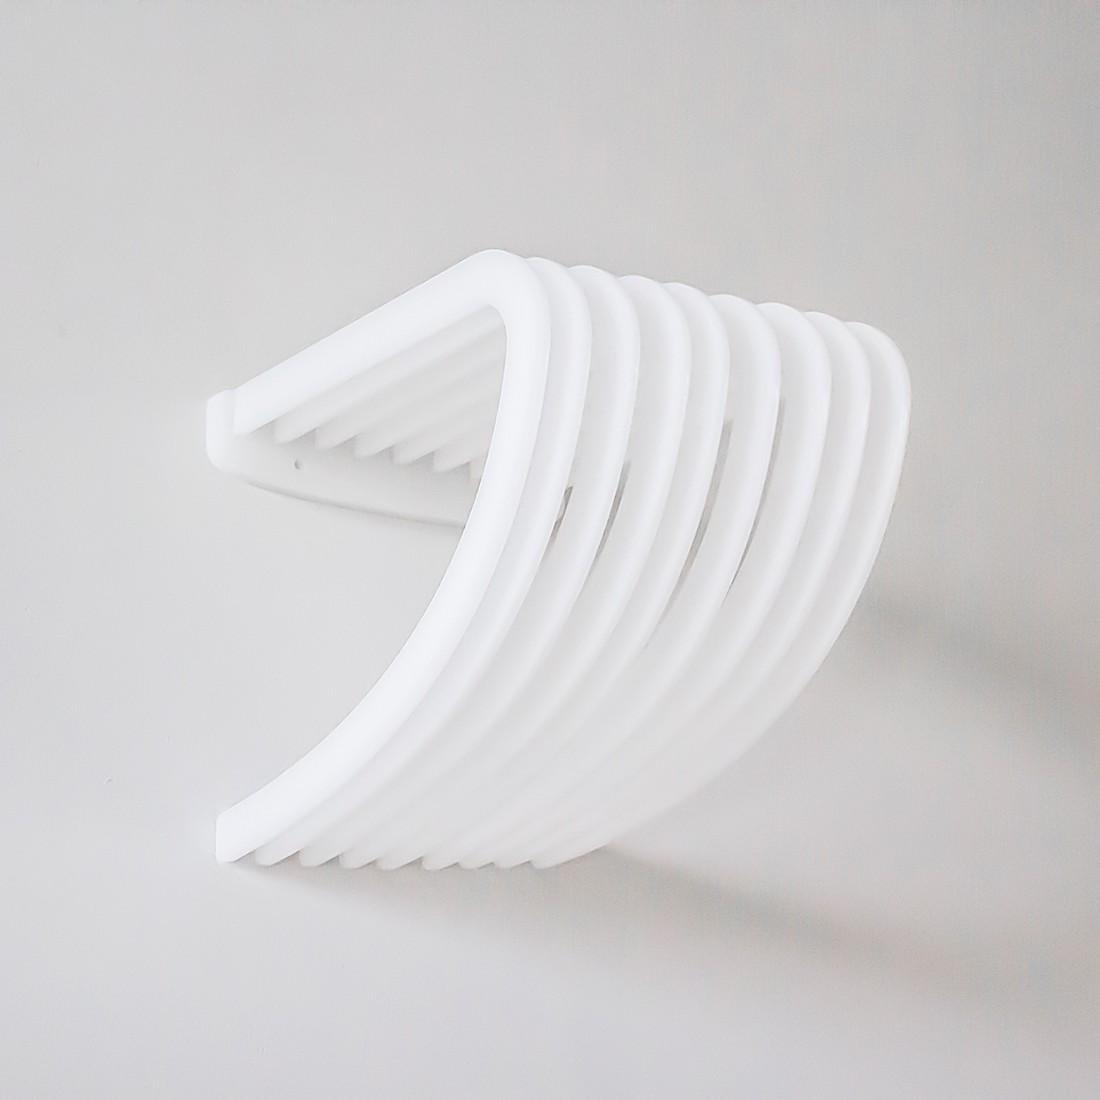 wandregal shell i wei metrocuadro design g nstig online kaufen. Black Bedroom Furniture Sets. Home Design Ideas